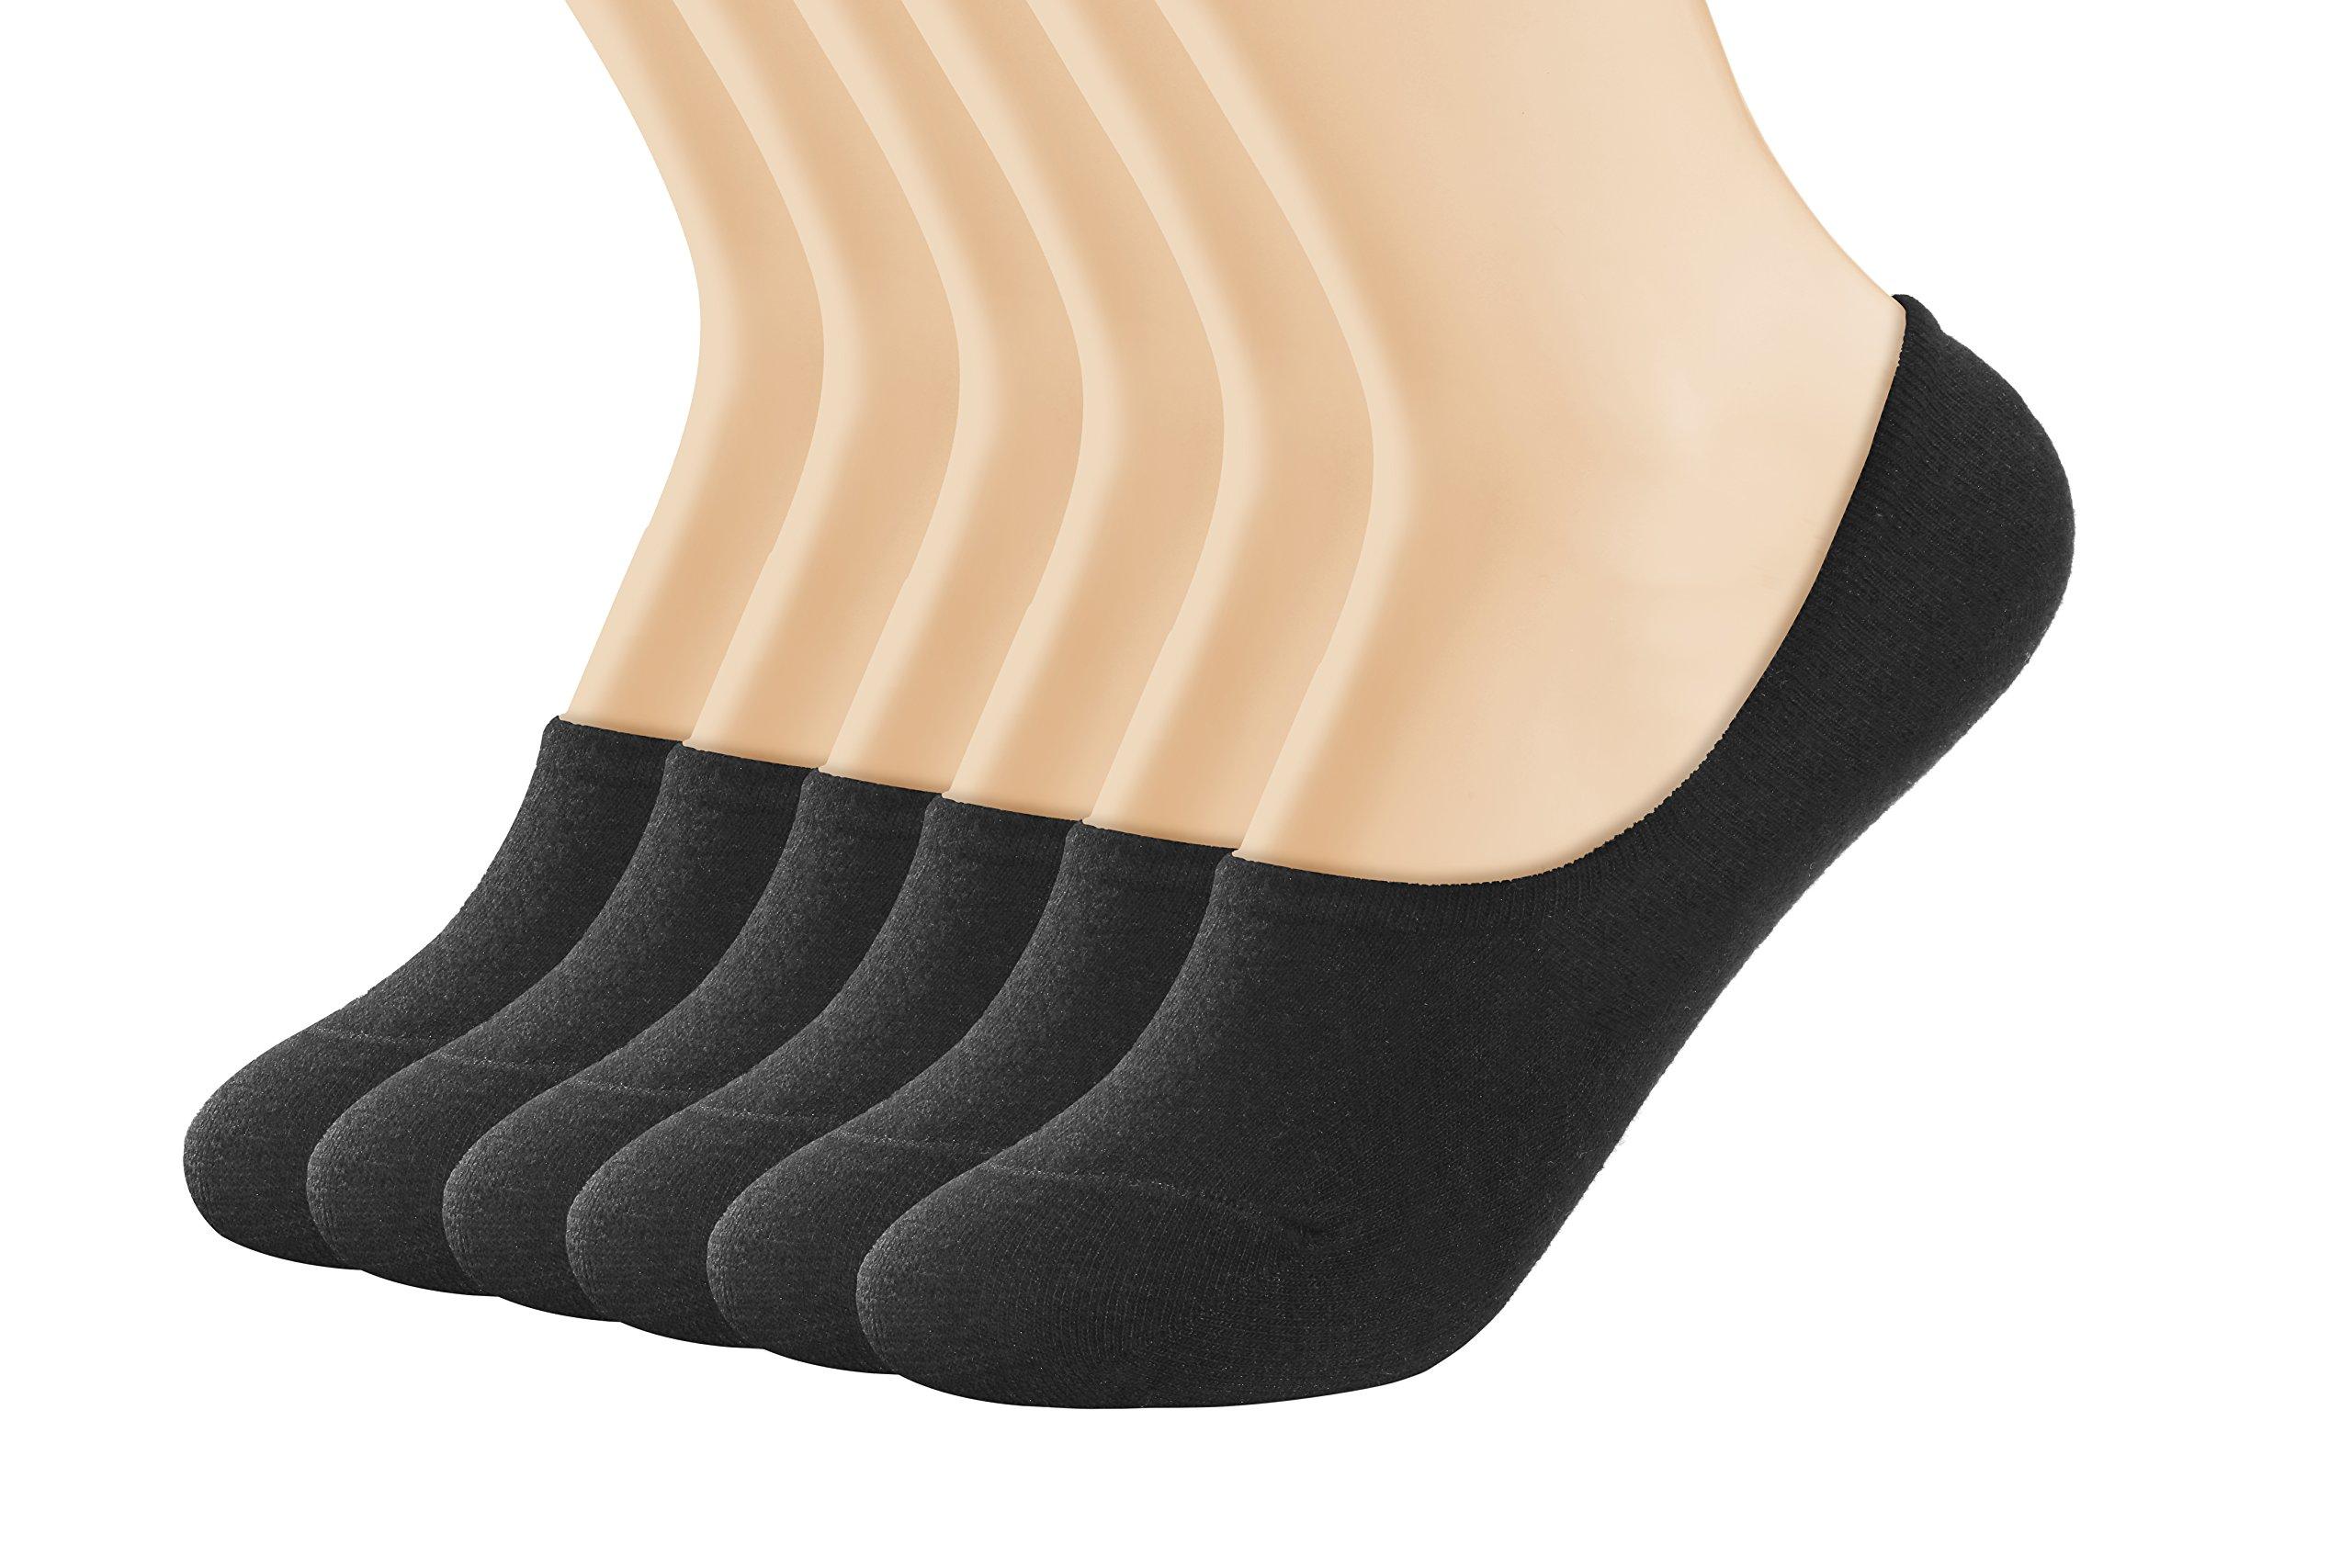 Women's Socks 6 Pack Thin Casual No Show Socks Non Slip Flat Boat Line (medium, black)